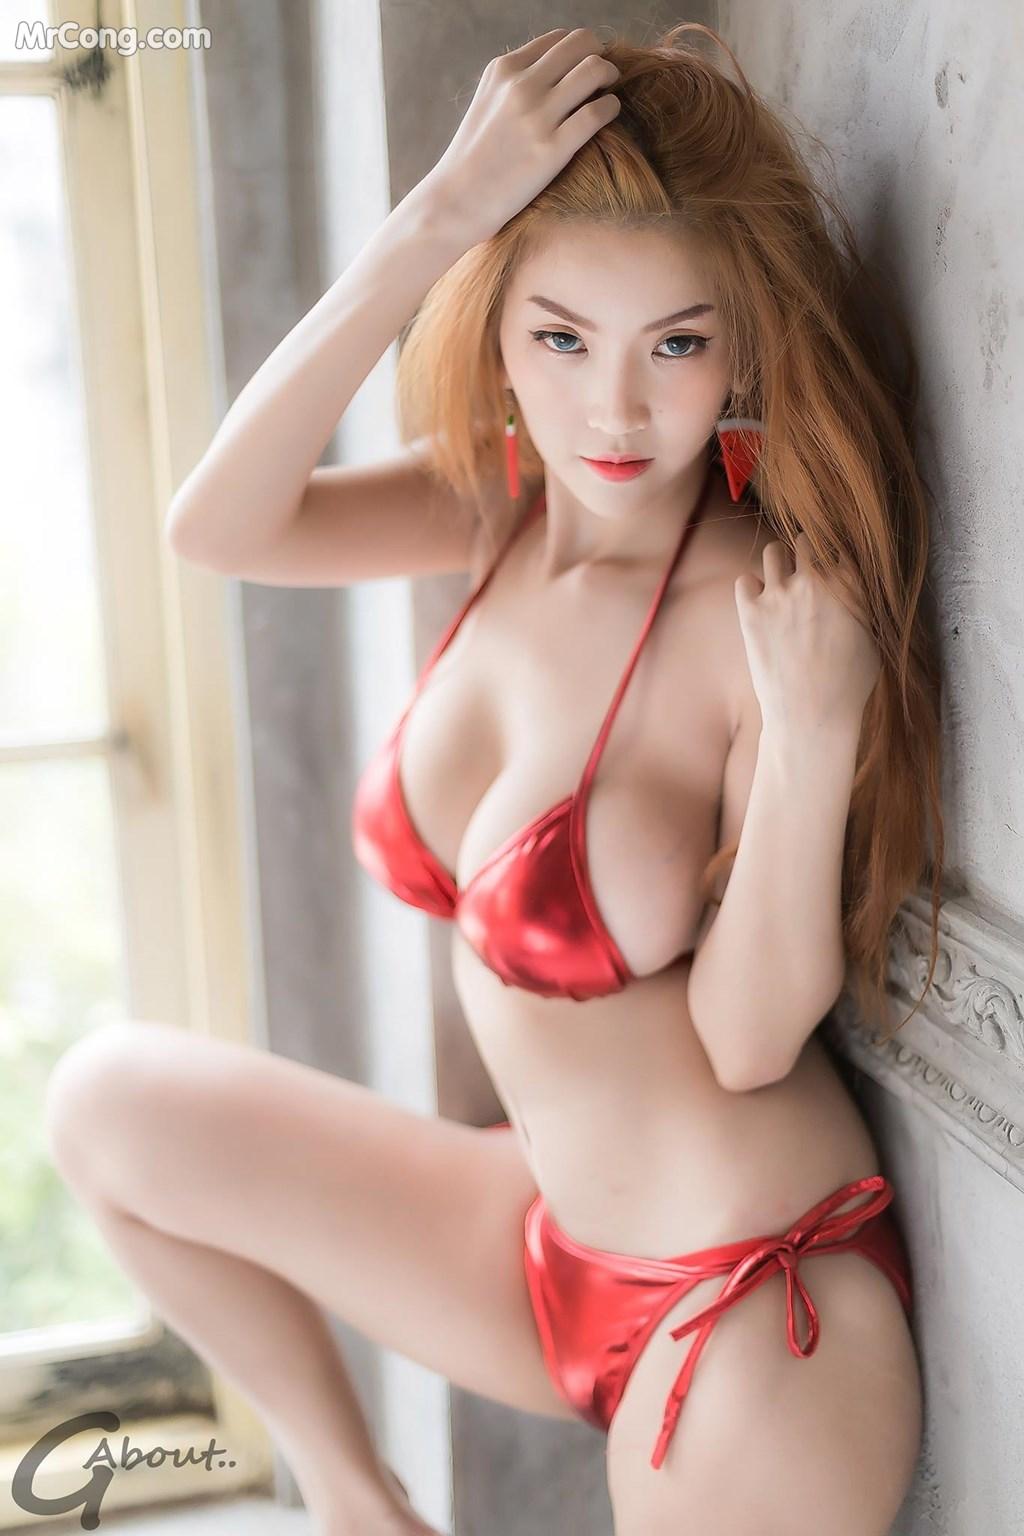 Image Thai-Model-No.482-Alisa-Rattanachawangkul-MrCong.com-005 in post Thai Model No.482: Người mẫu Alisa Rattanachawangkul (9 ảnh)